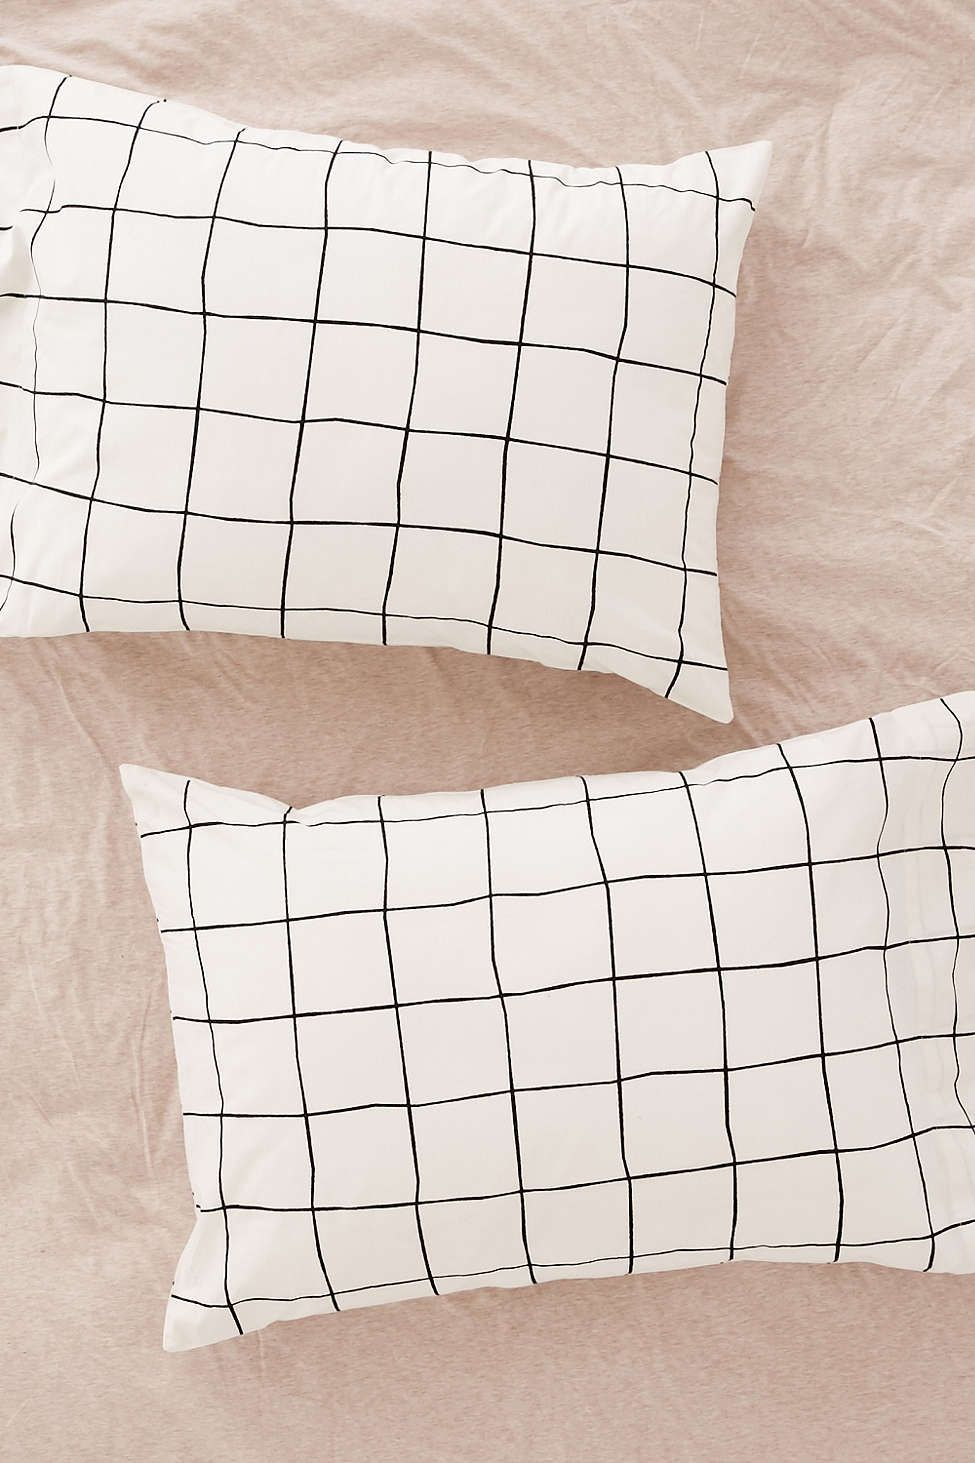 Wonky Grid Pillowcase Set Living Room Decor Apartment Remodel Bedroom White Pillow Cases #pillowcases #for #living #room